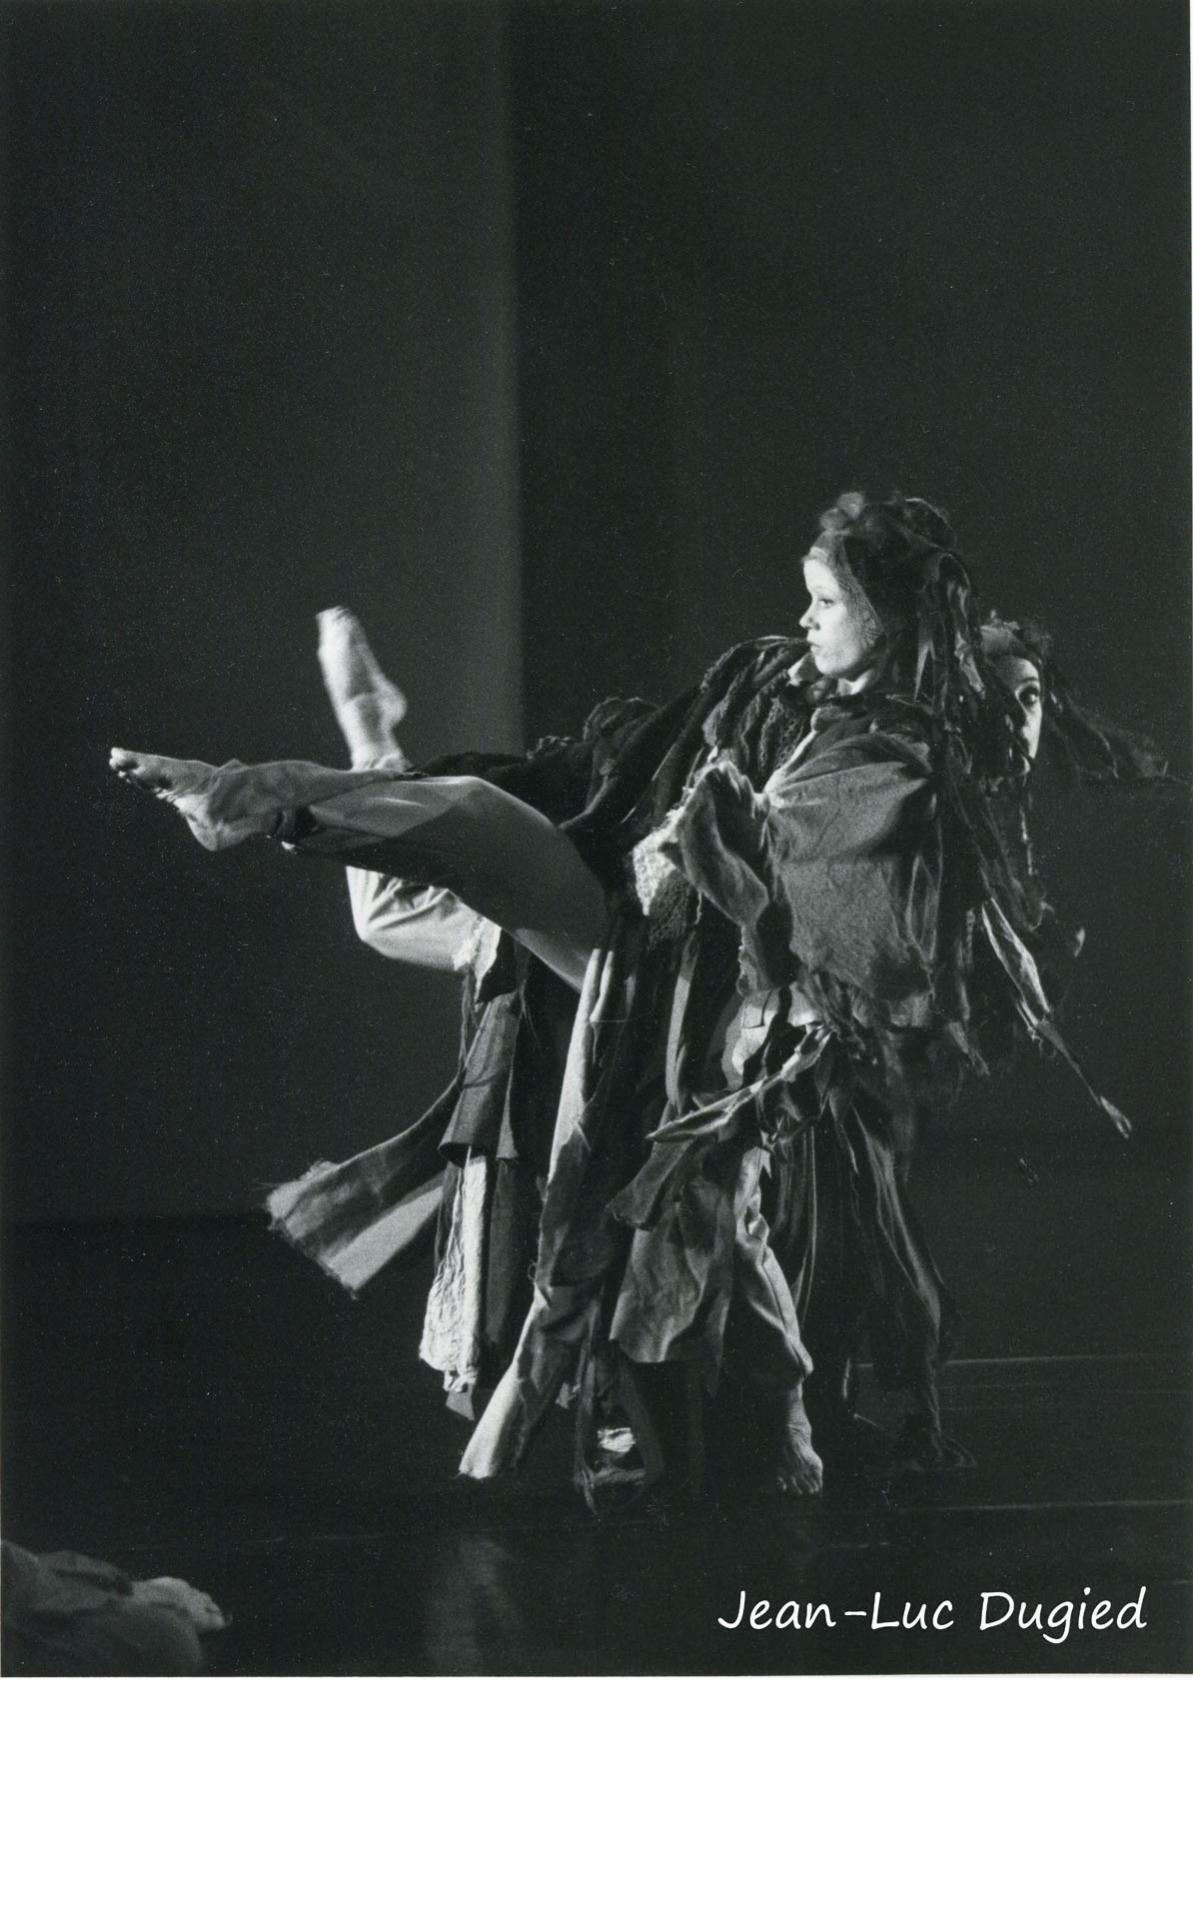 42 Witzman-Anaya Alejandro - 2010 personnages à danser - 1988